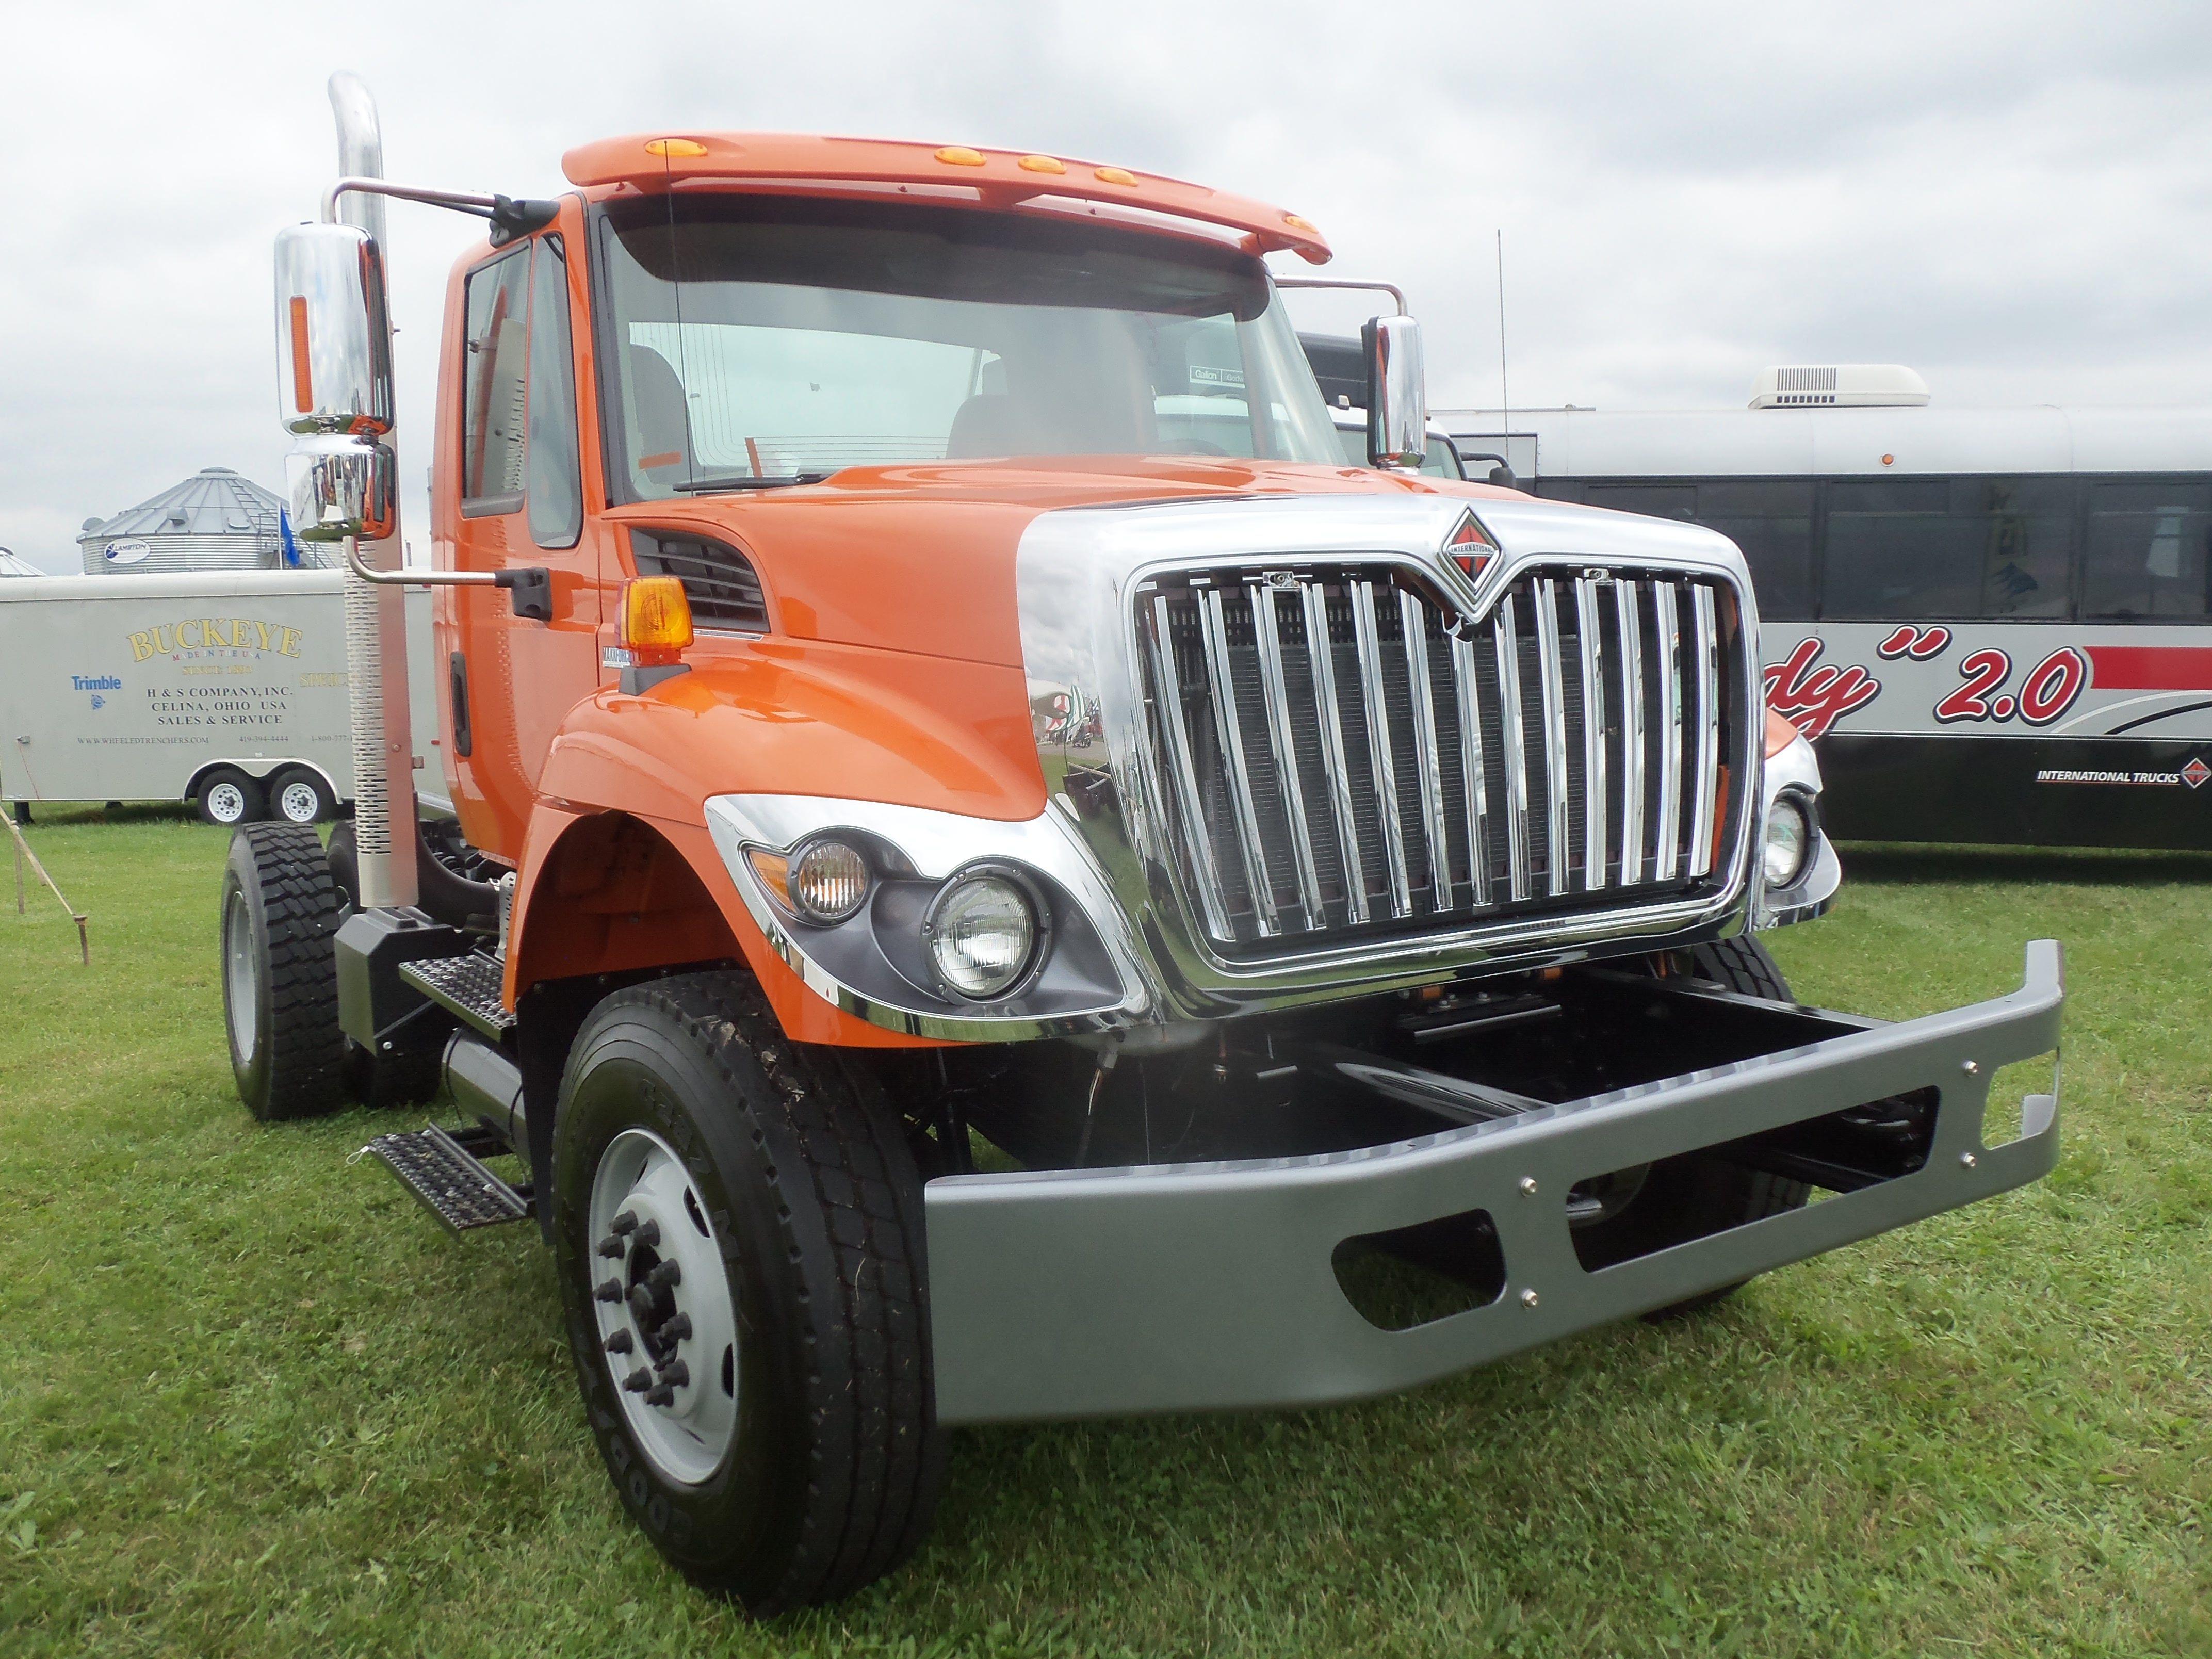 Nice looking orange International MaxxForce  truck